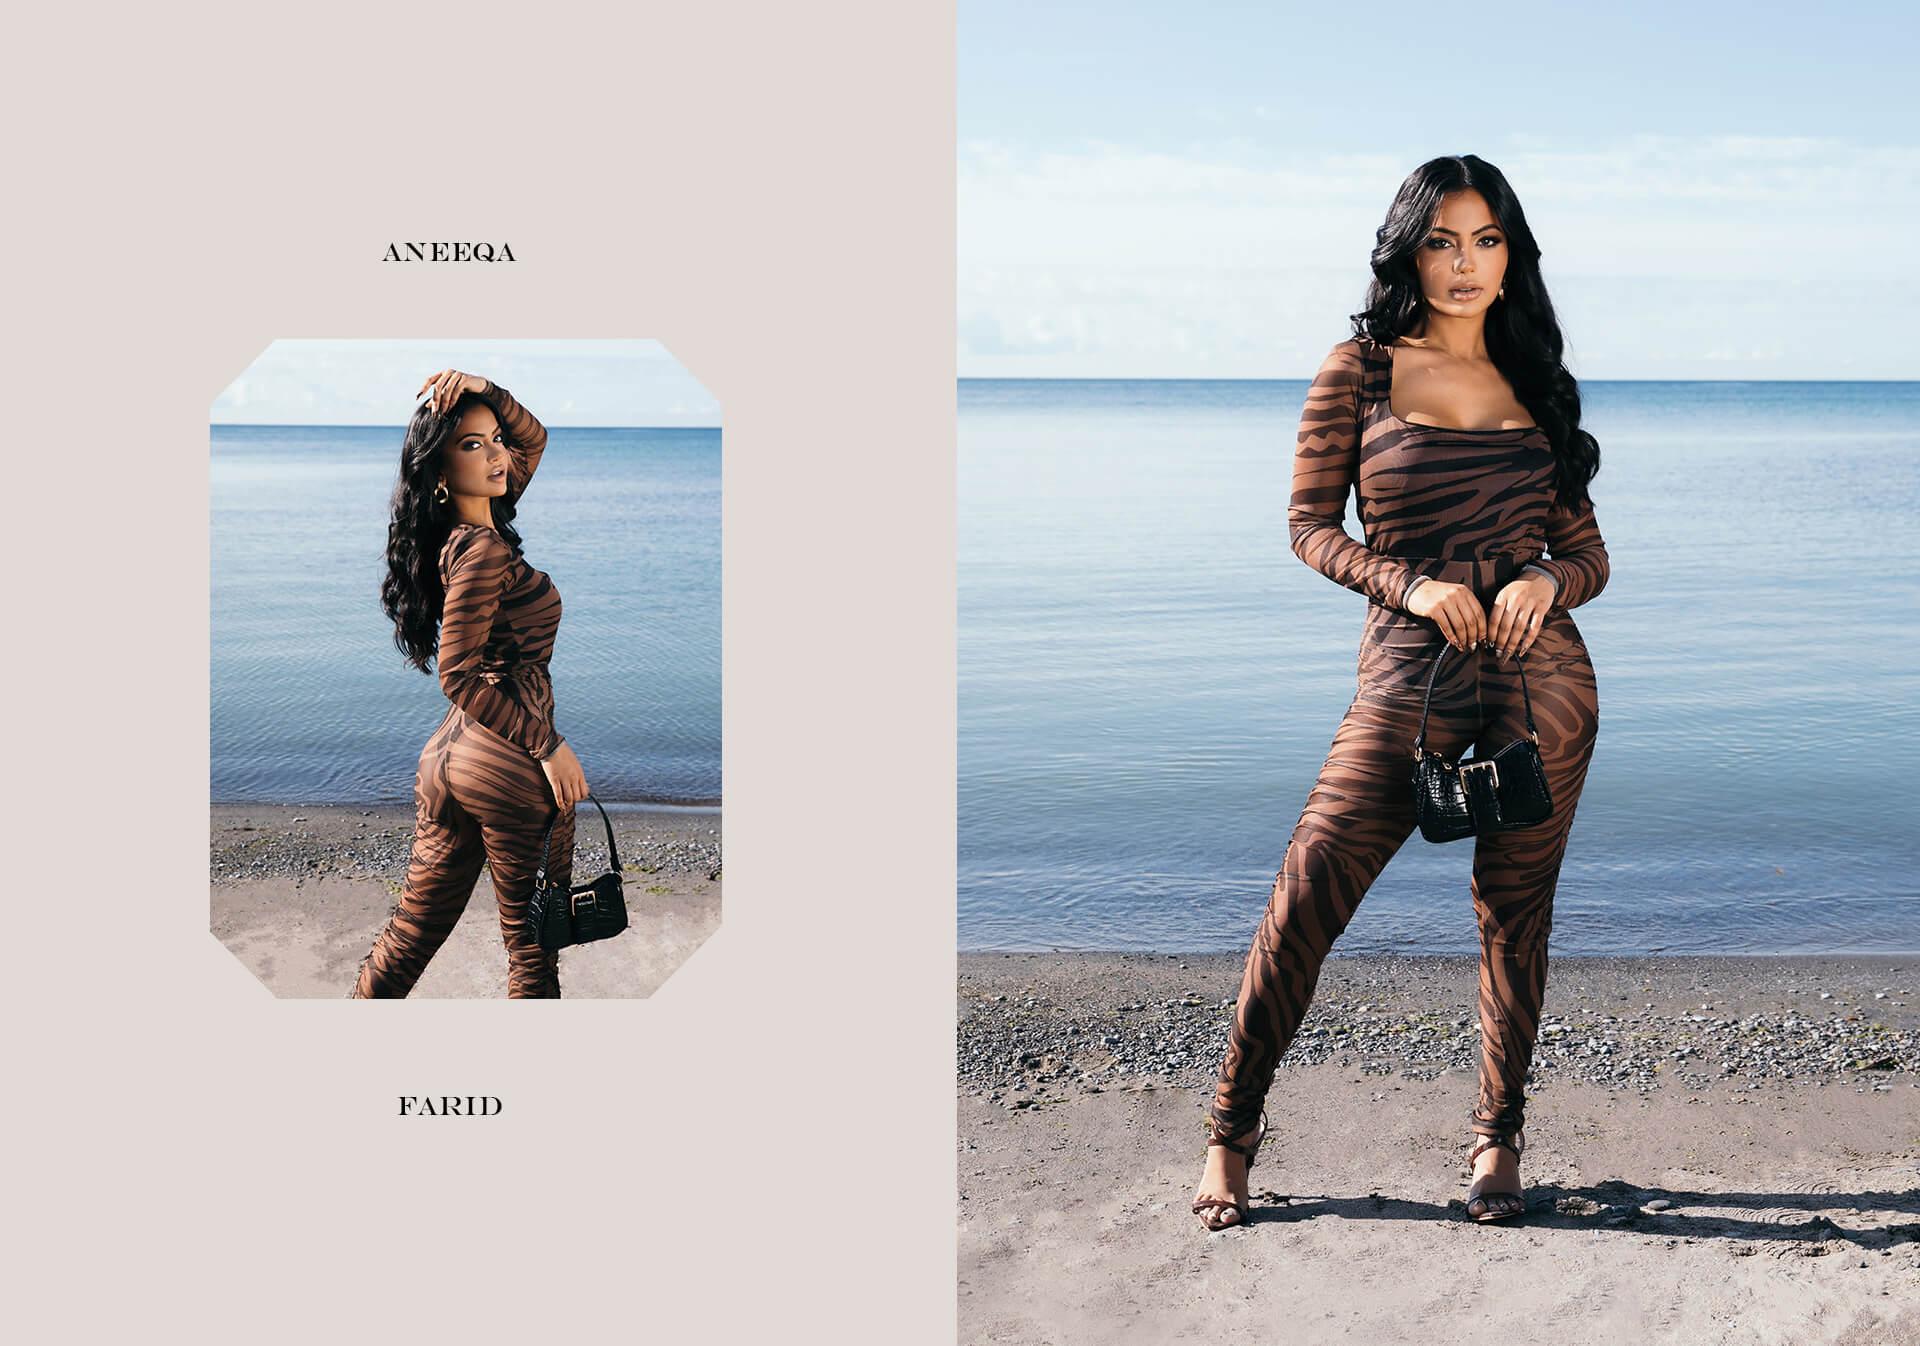 Aneeqa Farid Lookbook Image Desktop 10